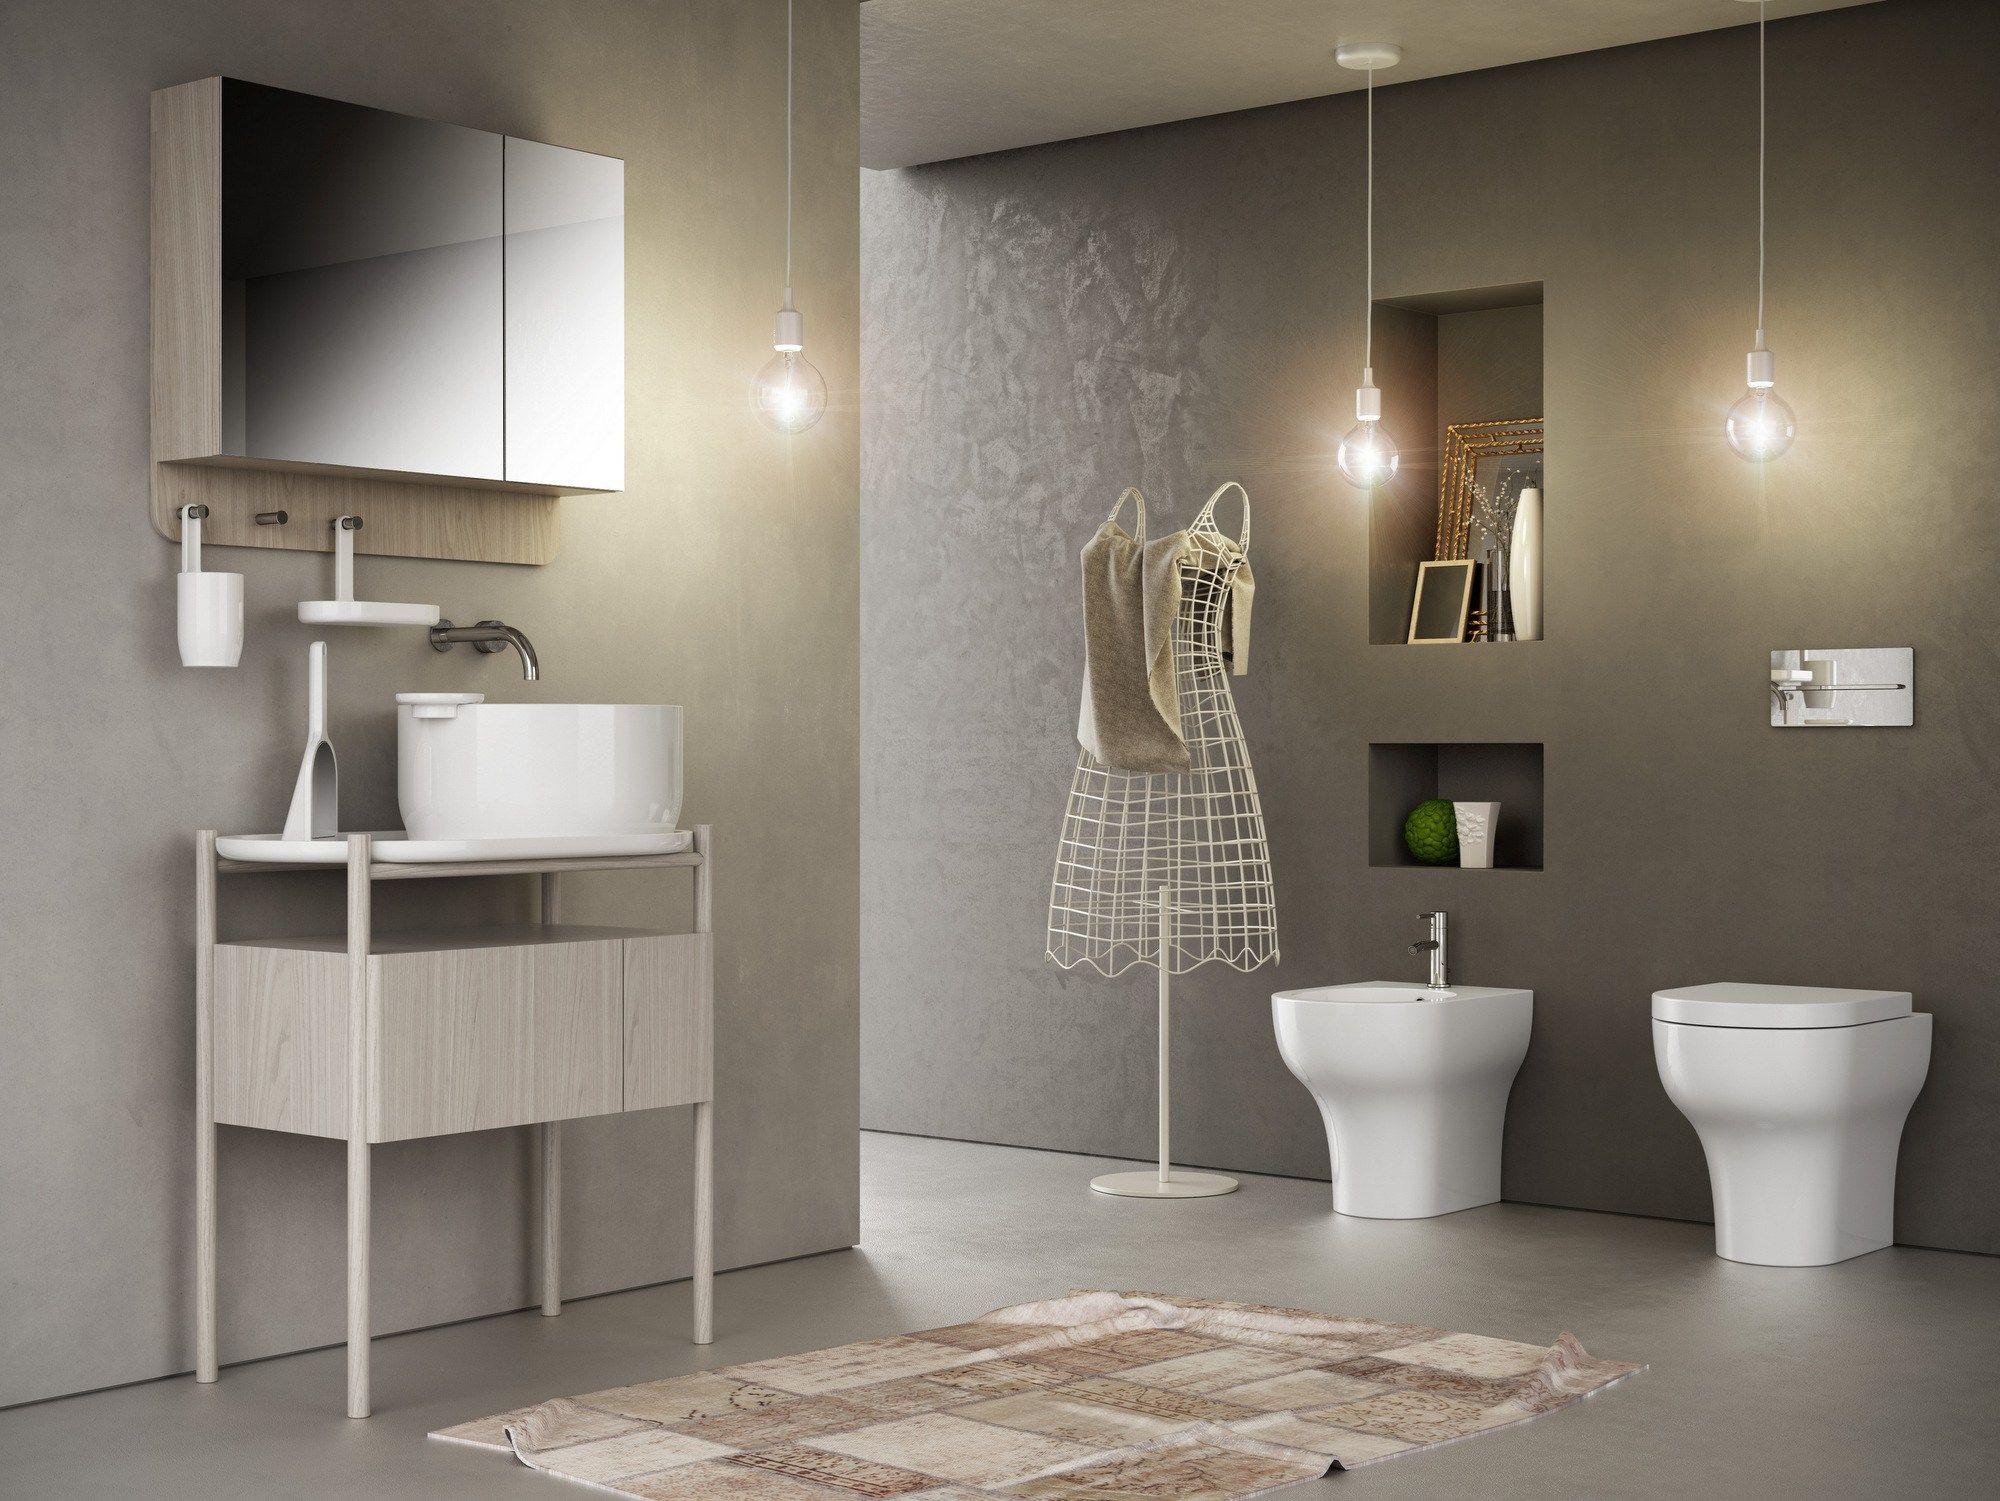 Ukiyo e lavabo sobre encimera by olympia ceramica for Embellecedor rebosadero lavabo